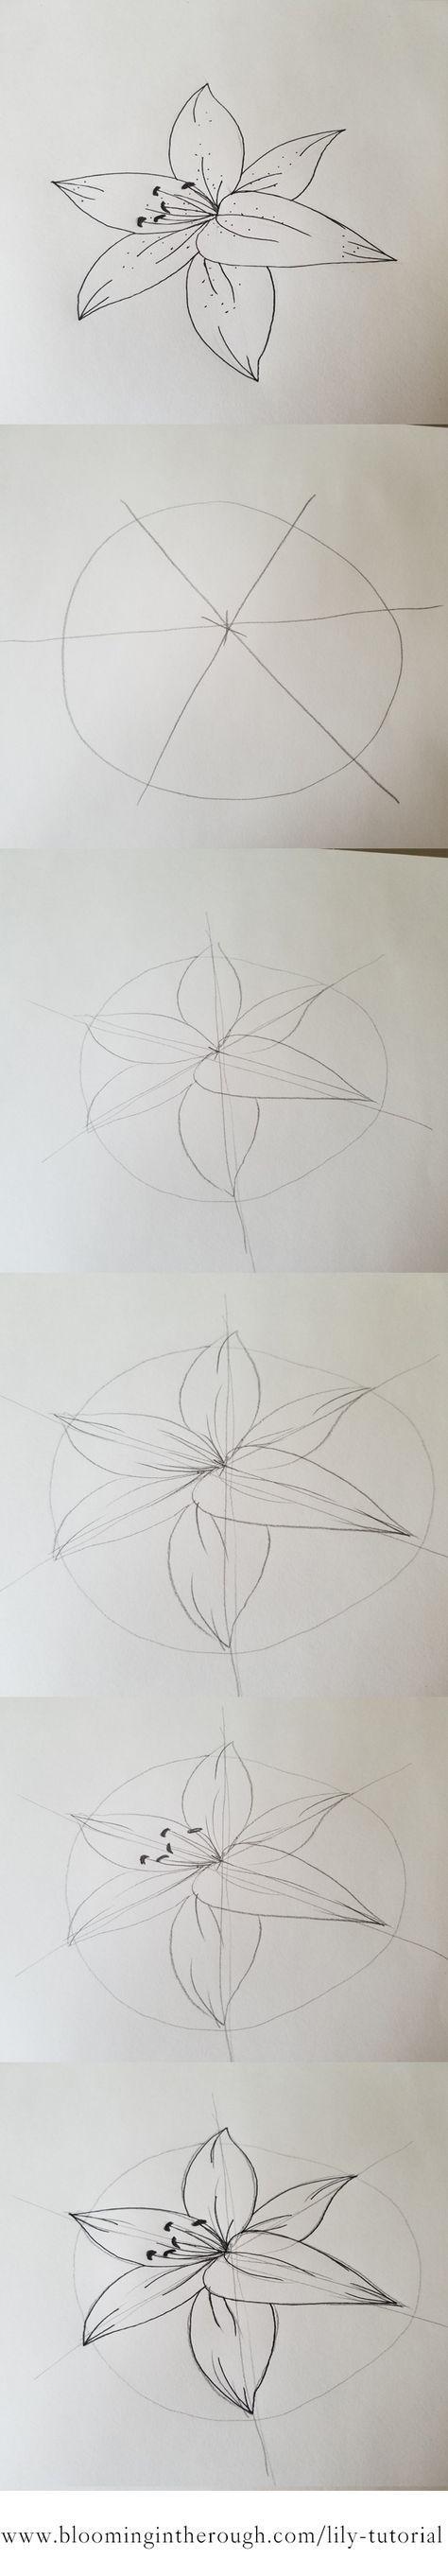 Cara Melukis Kanvas : melukis, kanvas, Tutorial, Flower, Drawing,, Drawings,, Drawings